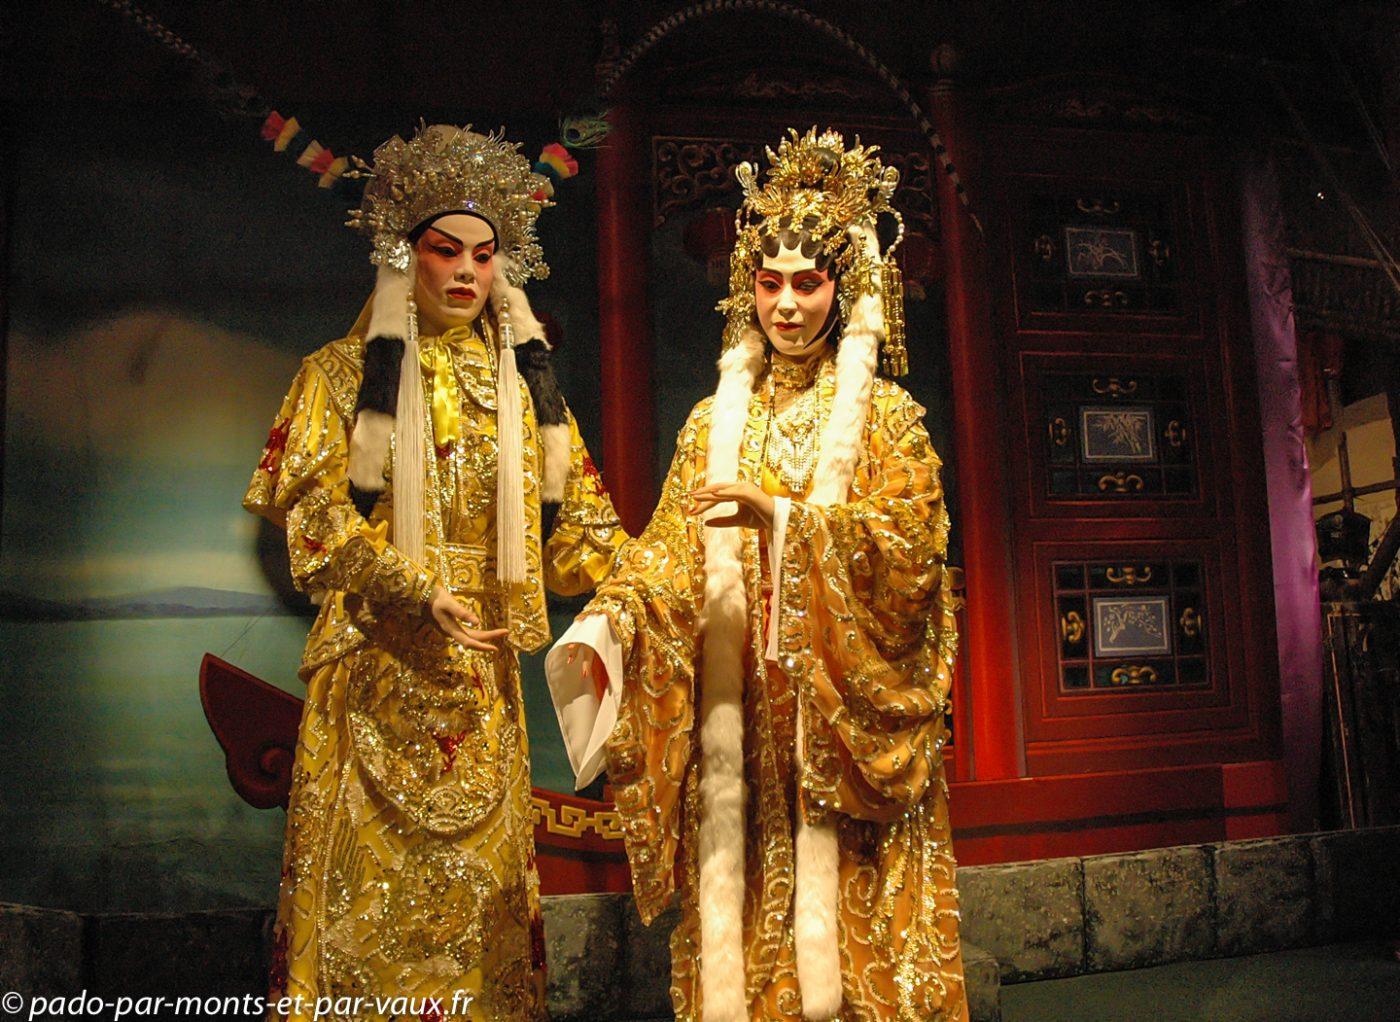 Musée d'histoire de Hong Kong